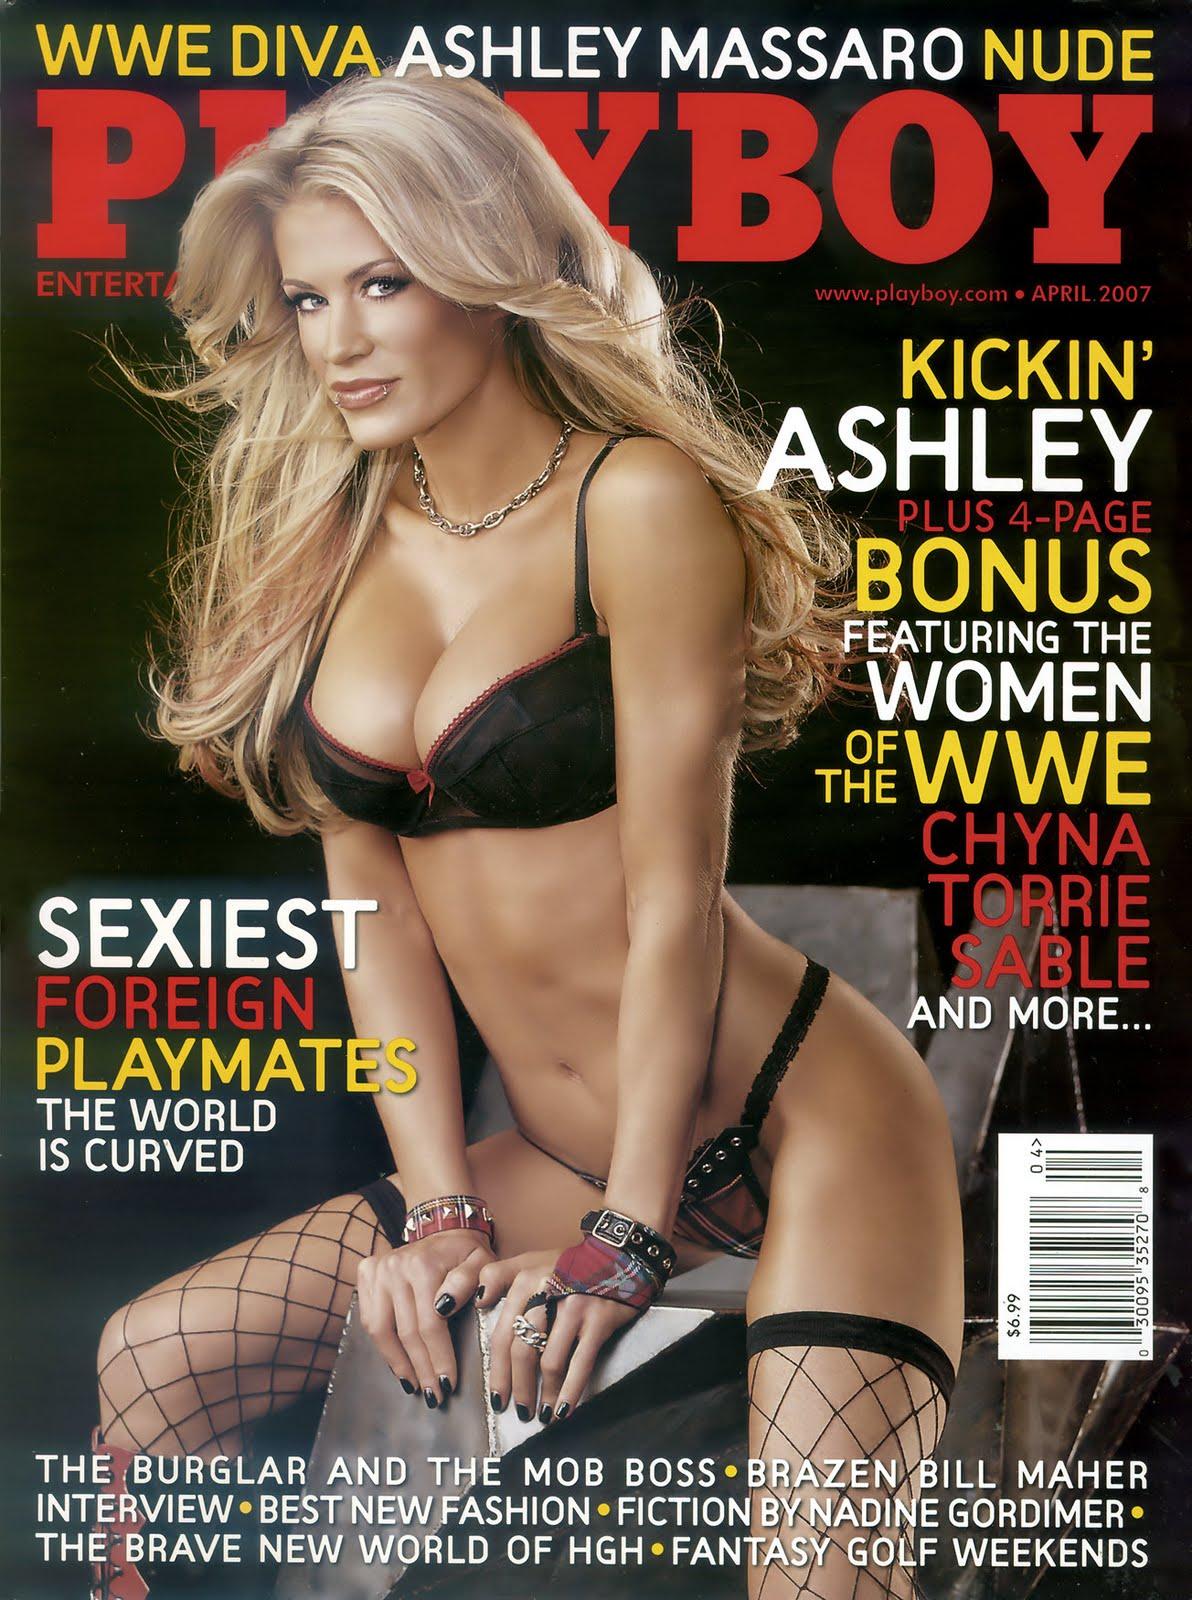 Stars Ashley Massaro Nude Playboy Photos Photos